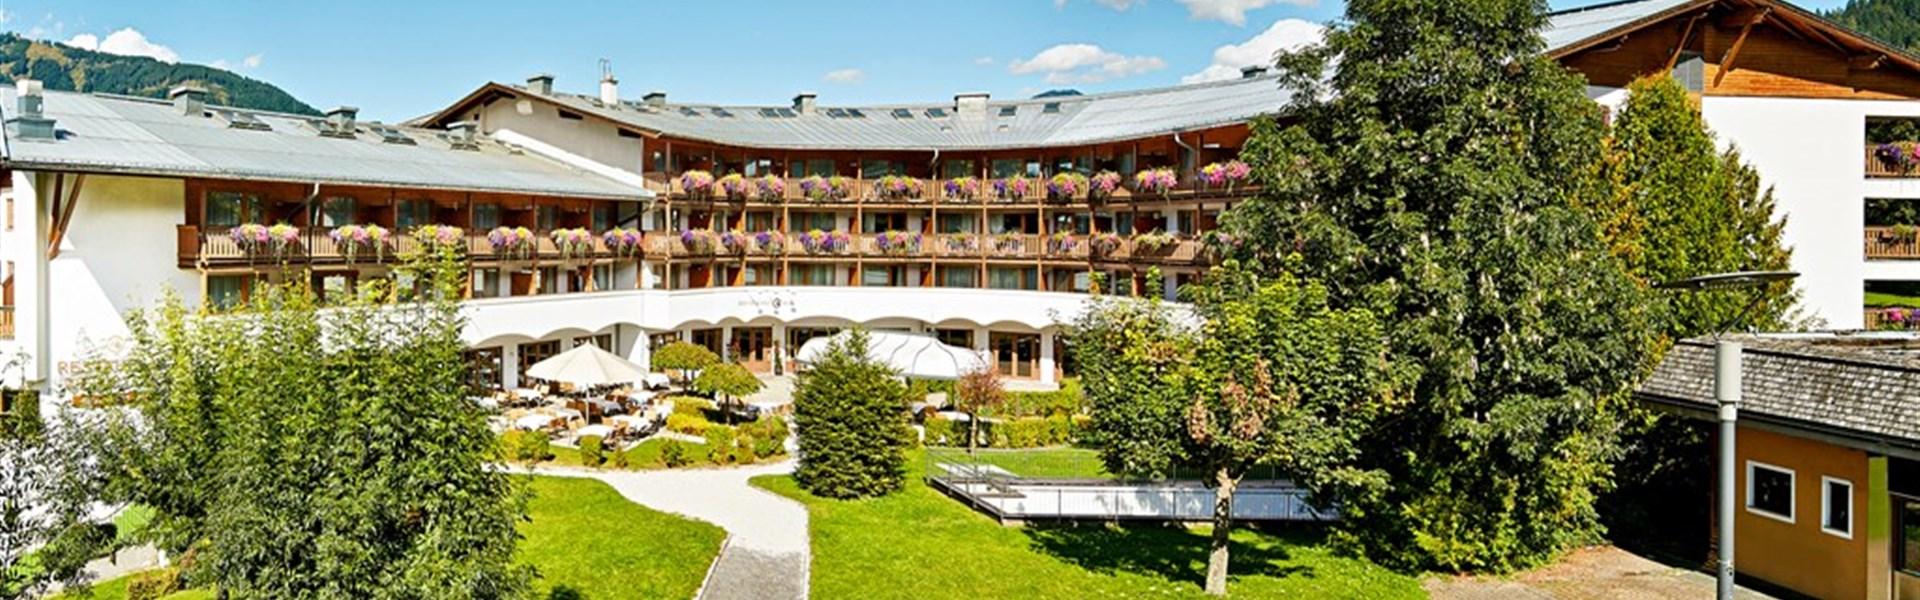 Marco Polo - Das Alpenhaus Kaprun S21 -